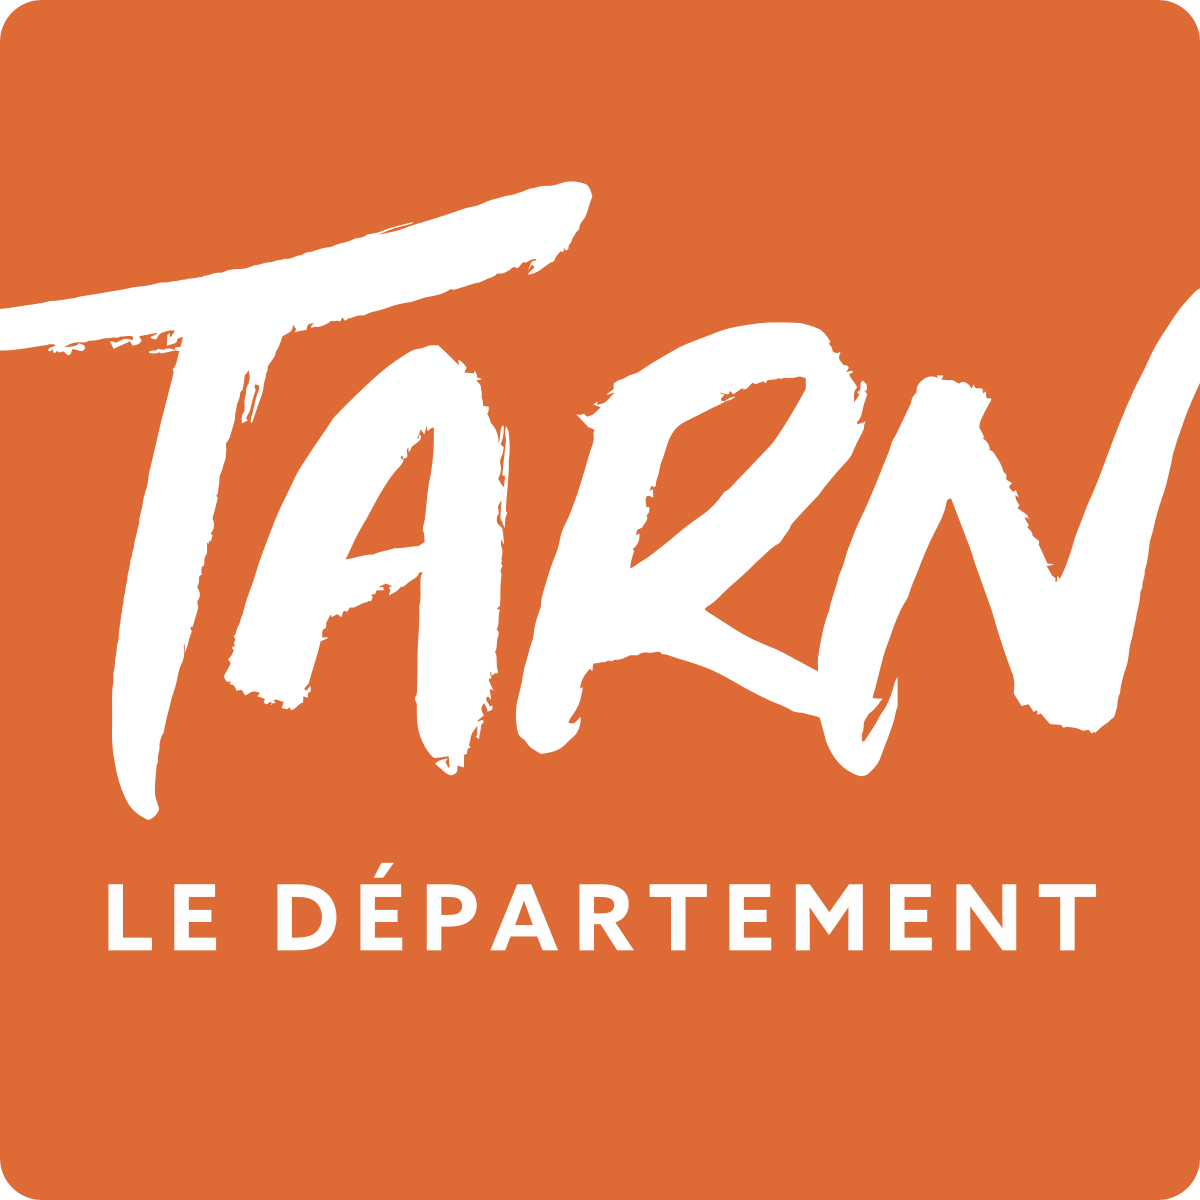 conseil-departemental-du-tarn